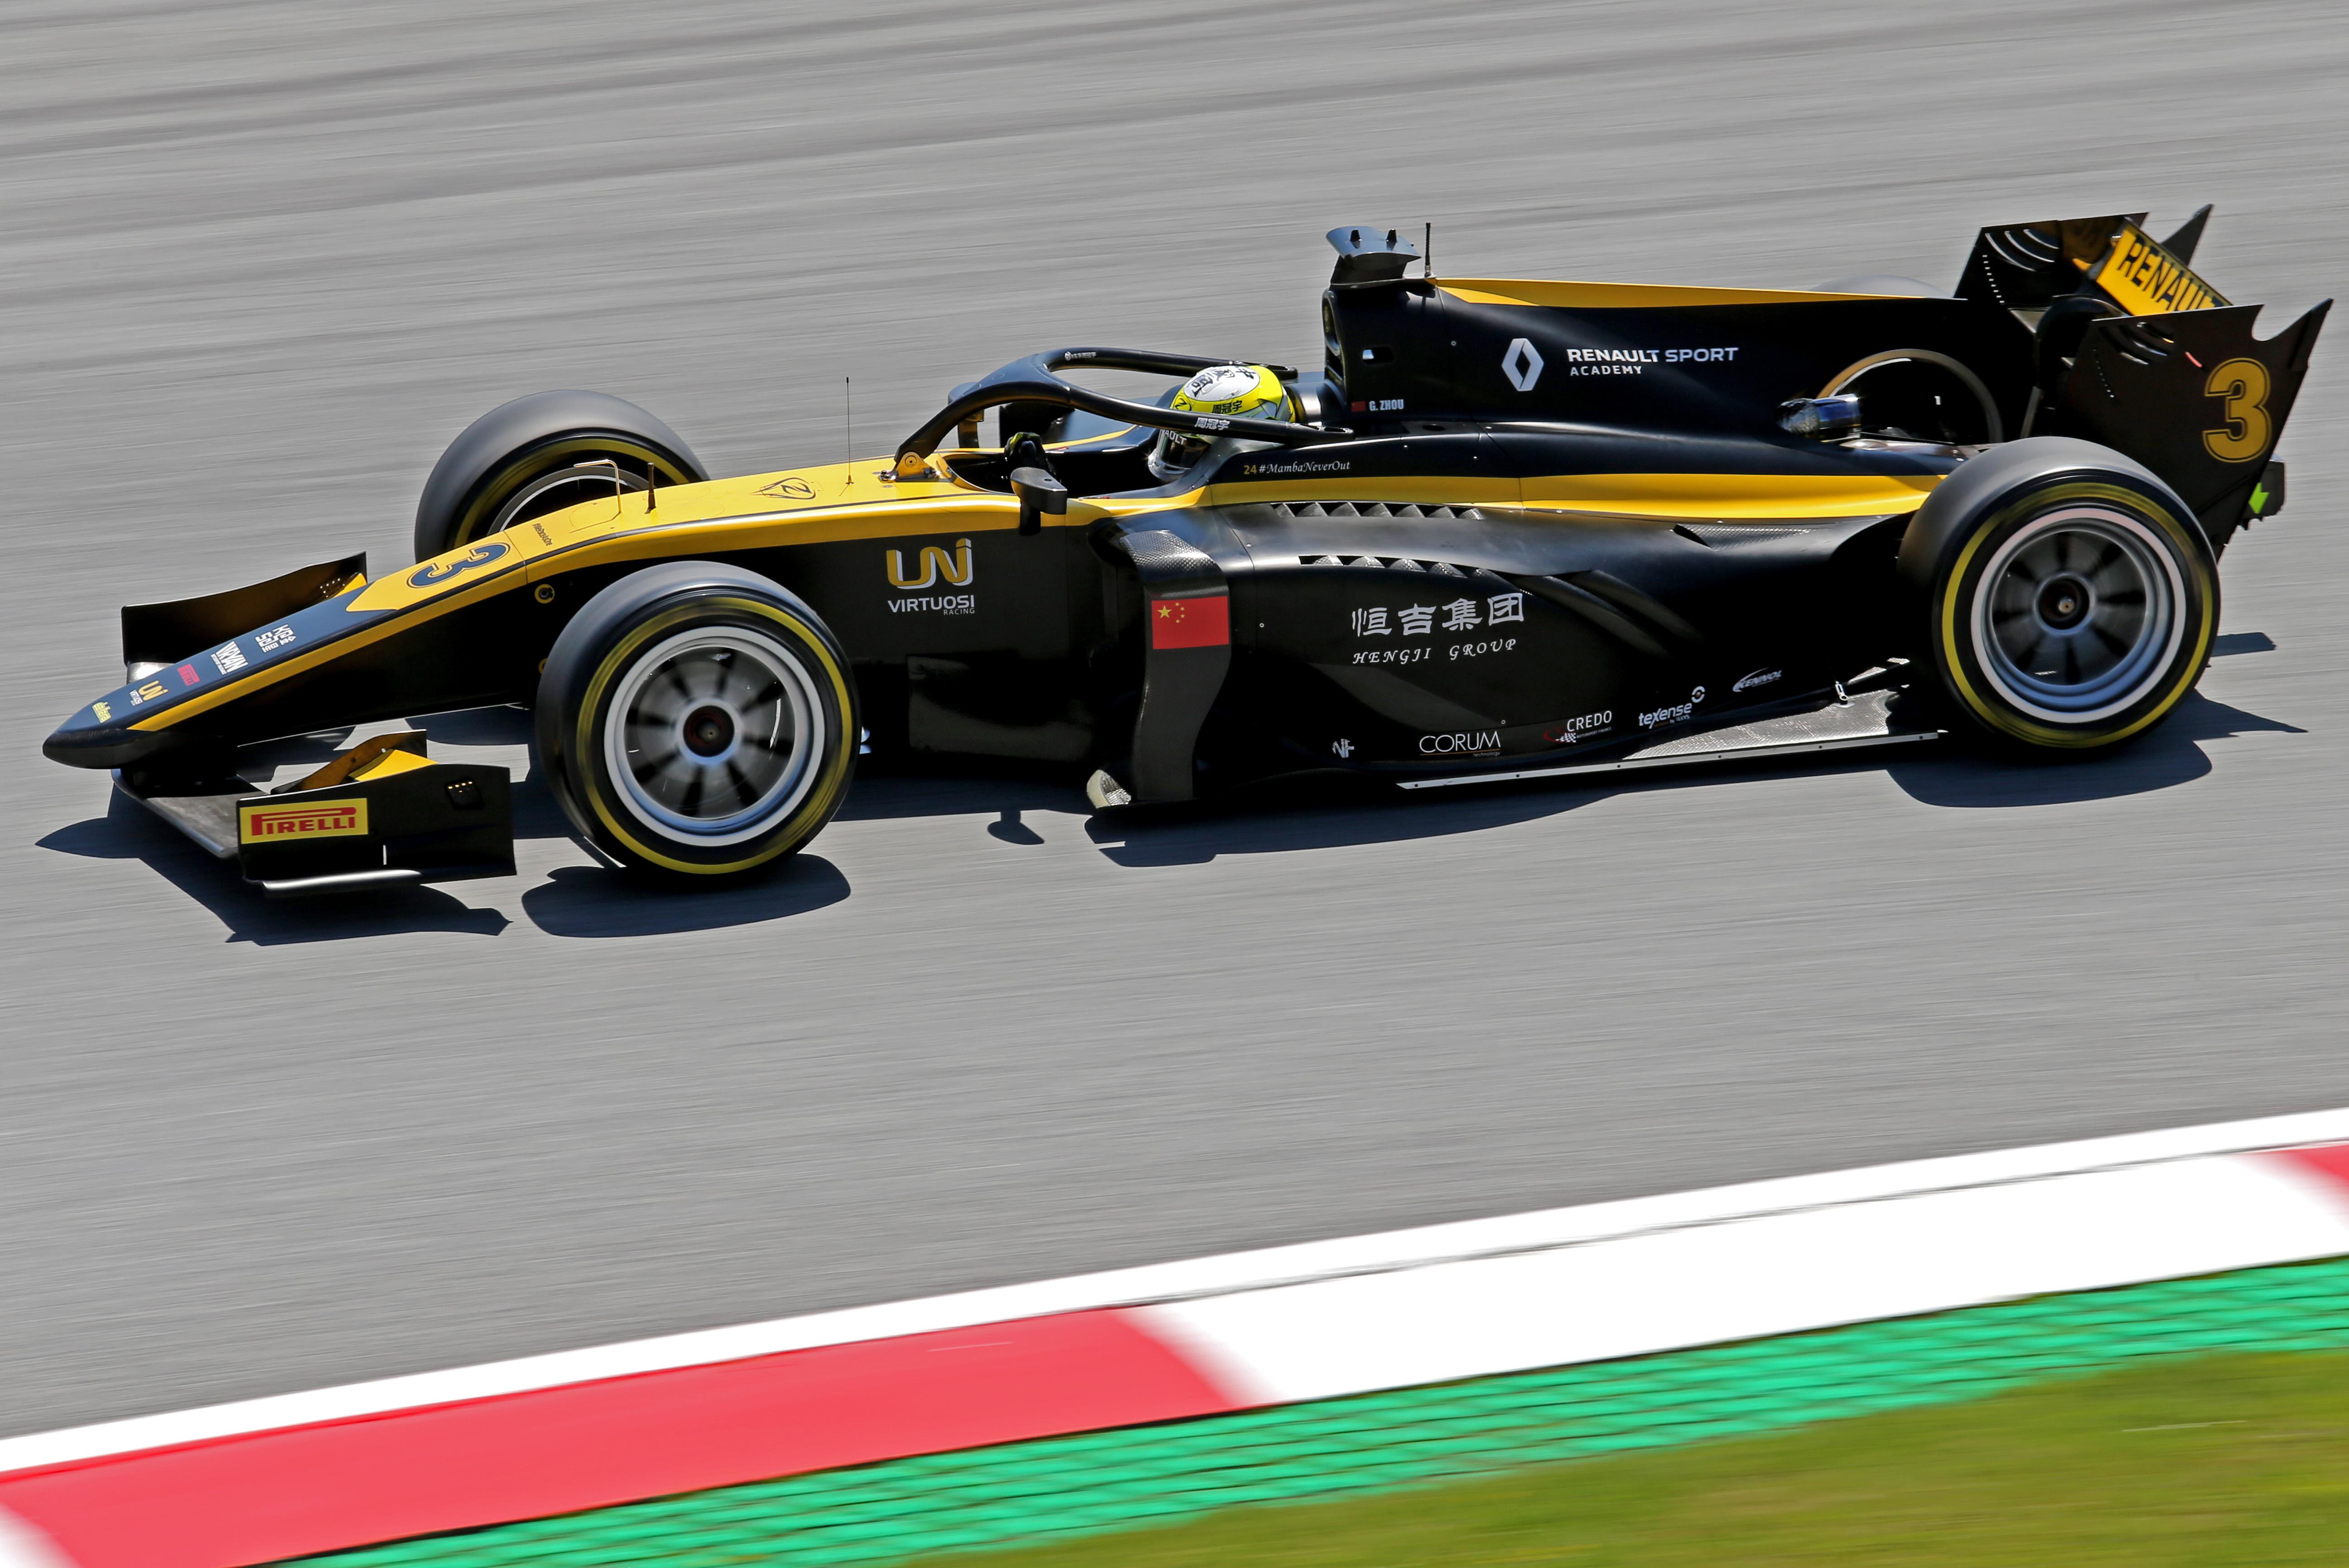 Motor Racing Fia Formula 2 Championship Friday Spielberg, Austria